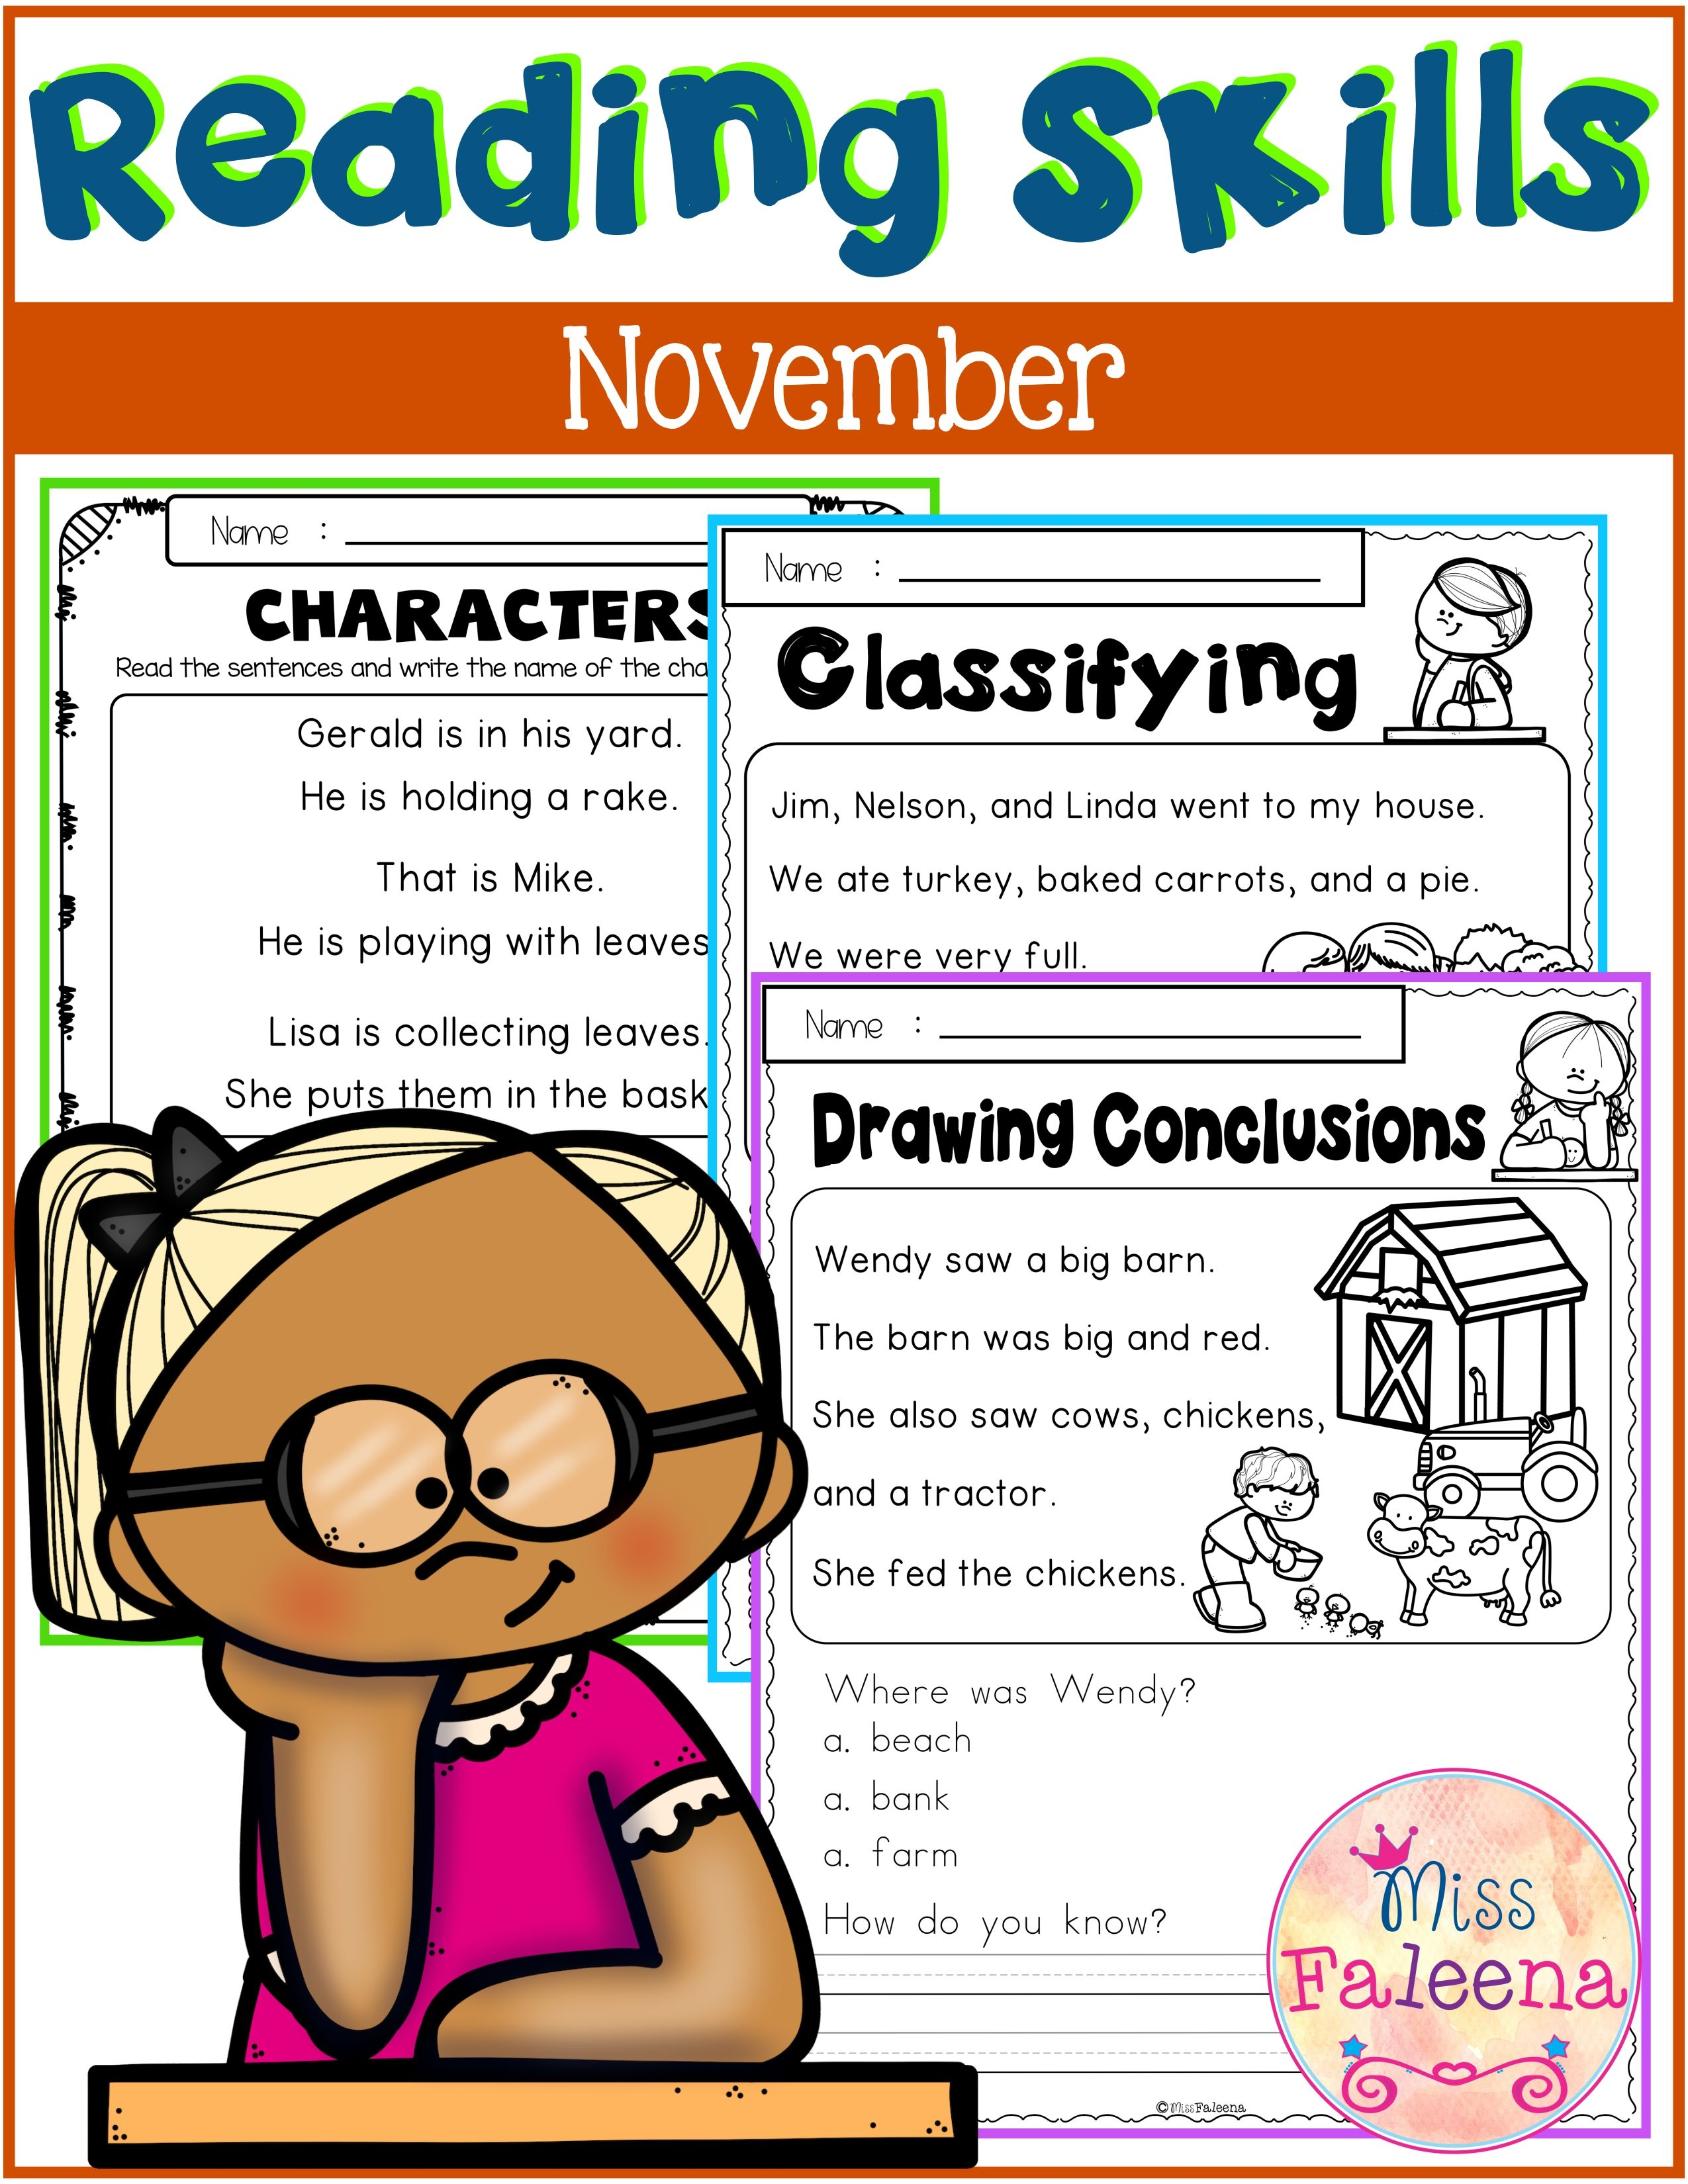 November Reading Skills